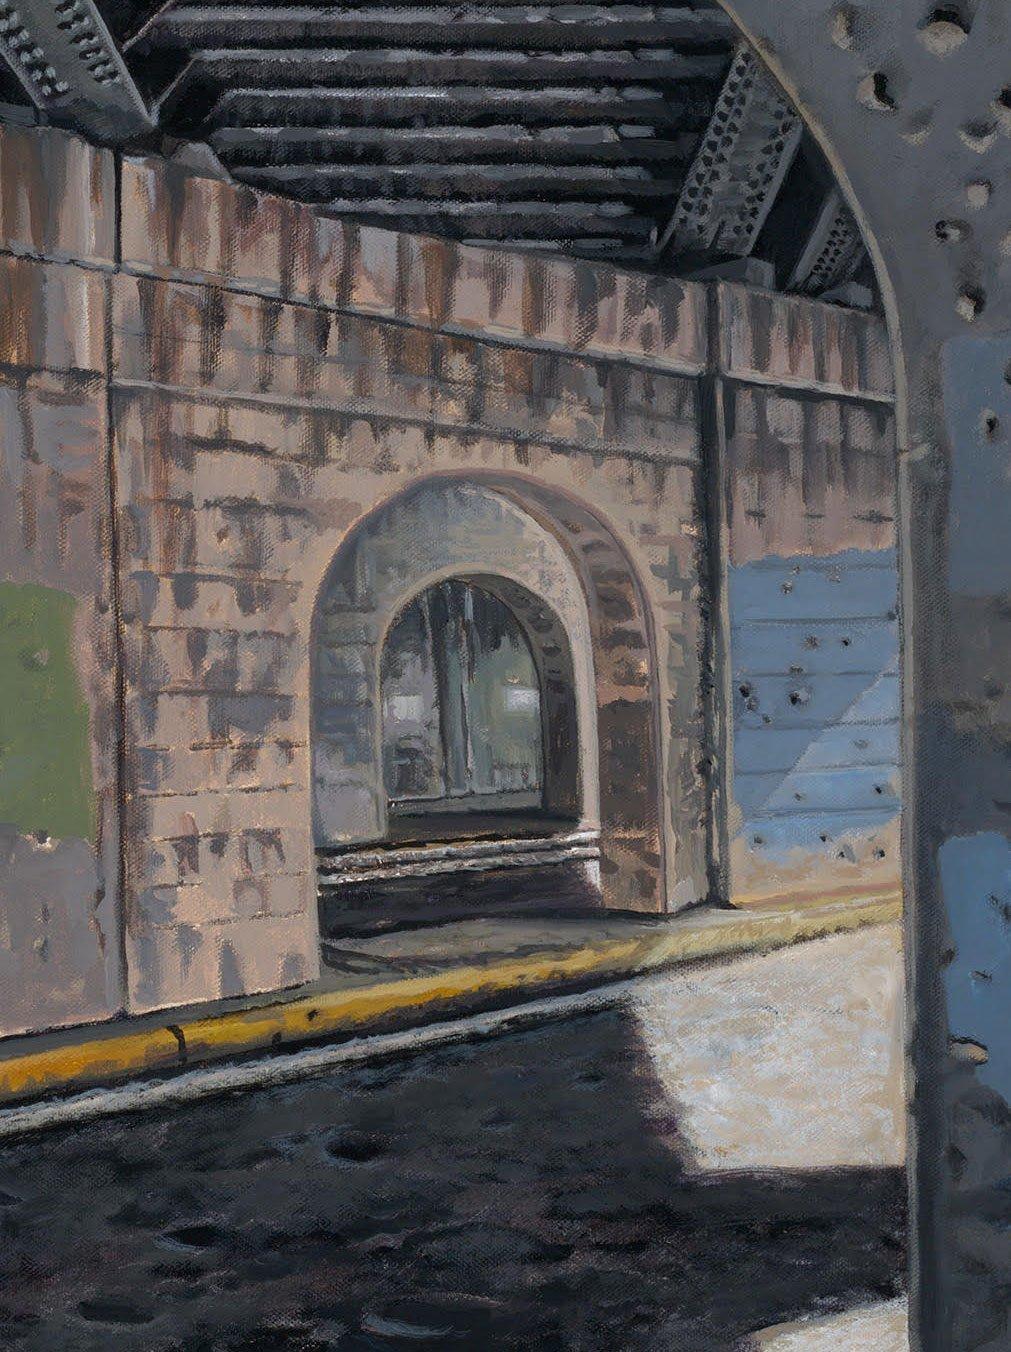 "Detail, Ben Jamin, 48"" x 36"", acrylic on canvas, 3/28/19, © Steve Miller 2019"